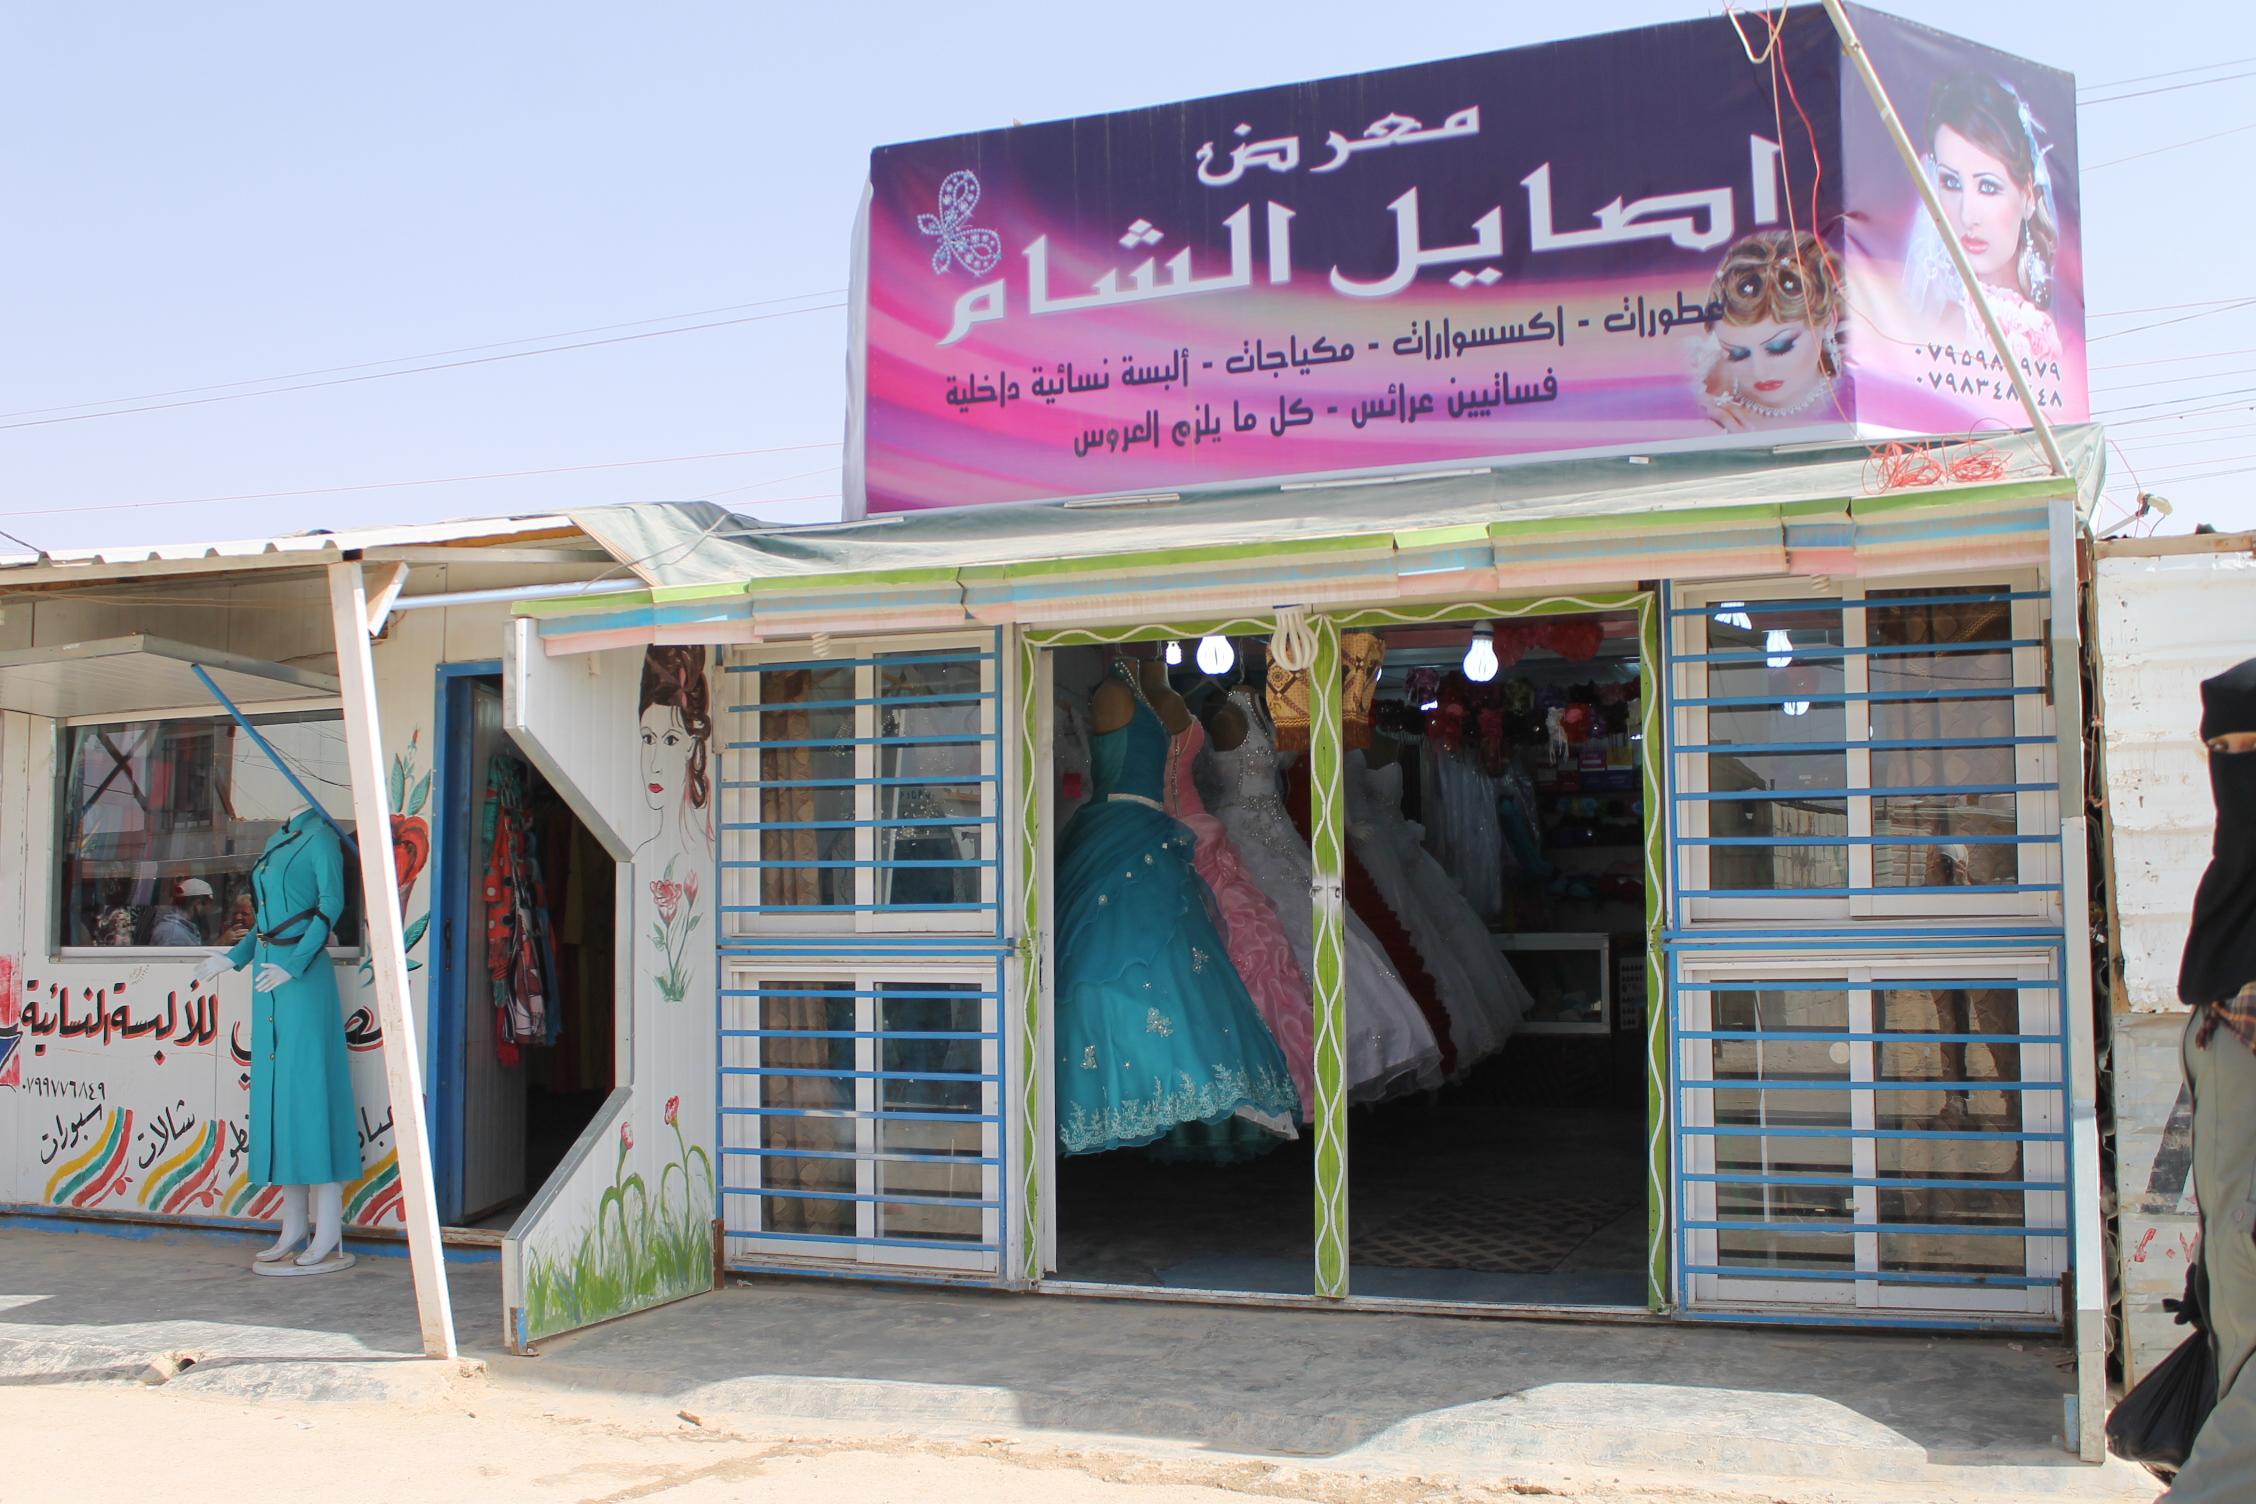 A shop in the market at Zaatari camp.